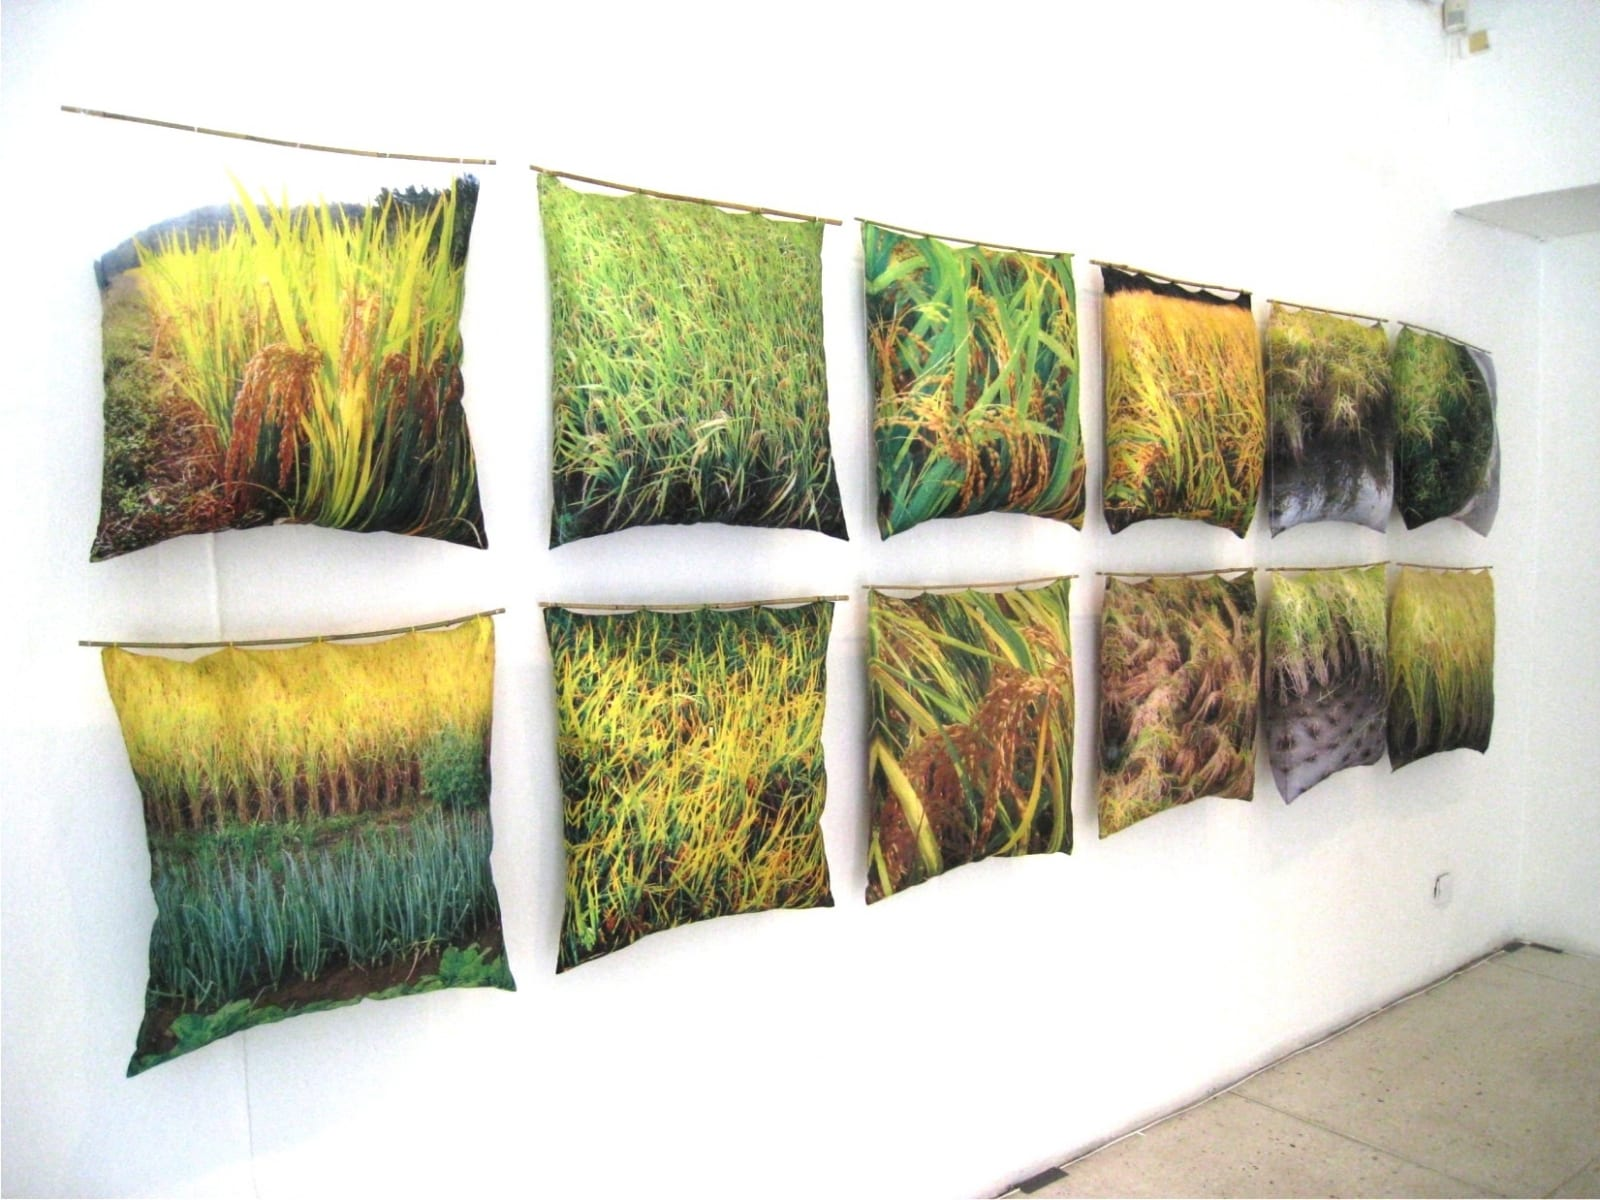 """RIISIPÕLDUDE MAA KOREA"" installatsioon patjadest 2011  20-50 patja mõõdus 60x60 cm  kangale trükitud Korea riisipõldude fotod, padjatäidis,bambuspulk <br/>""KOREA- THE LAND OF RICE FIELDS"" installation of pillows 2011  20-50 pillows measures 60x60 cm  photos of rice fields printed on canvas,pillowfill,bamboo"